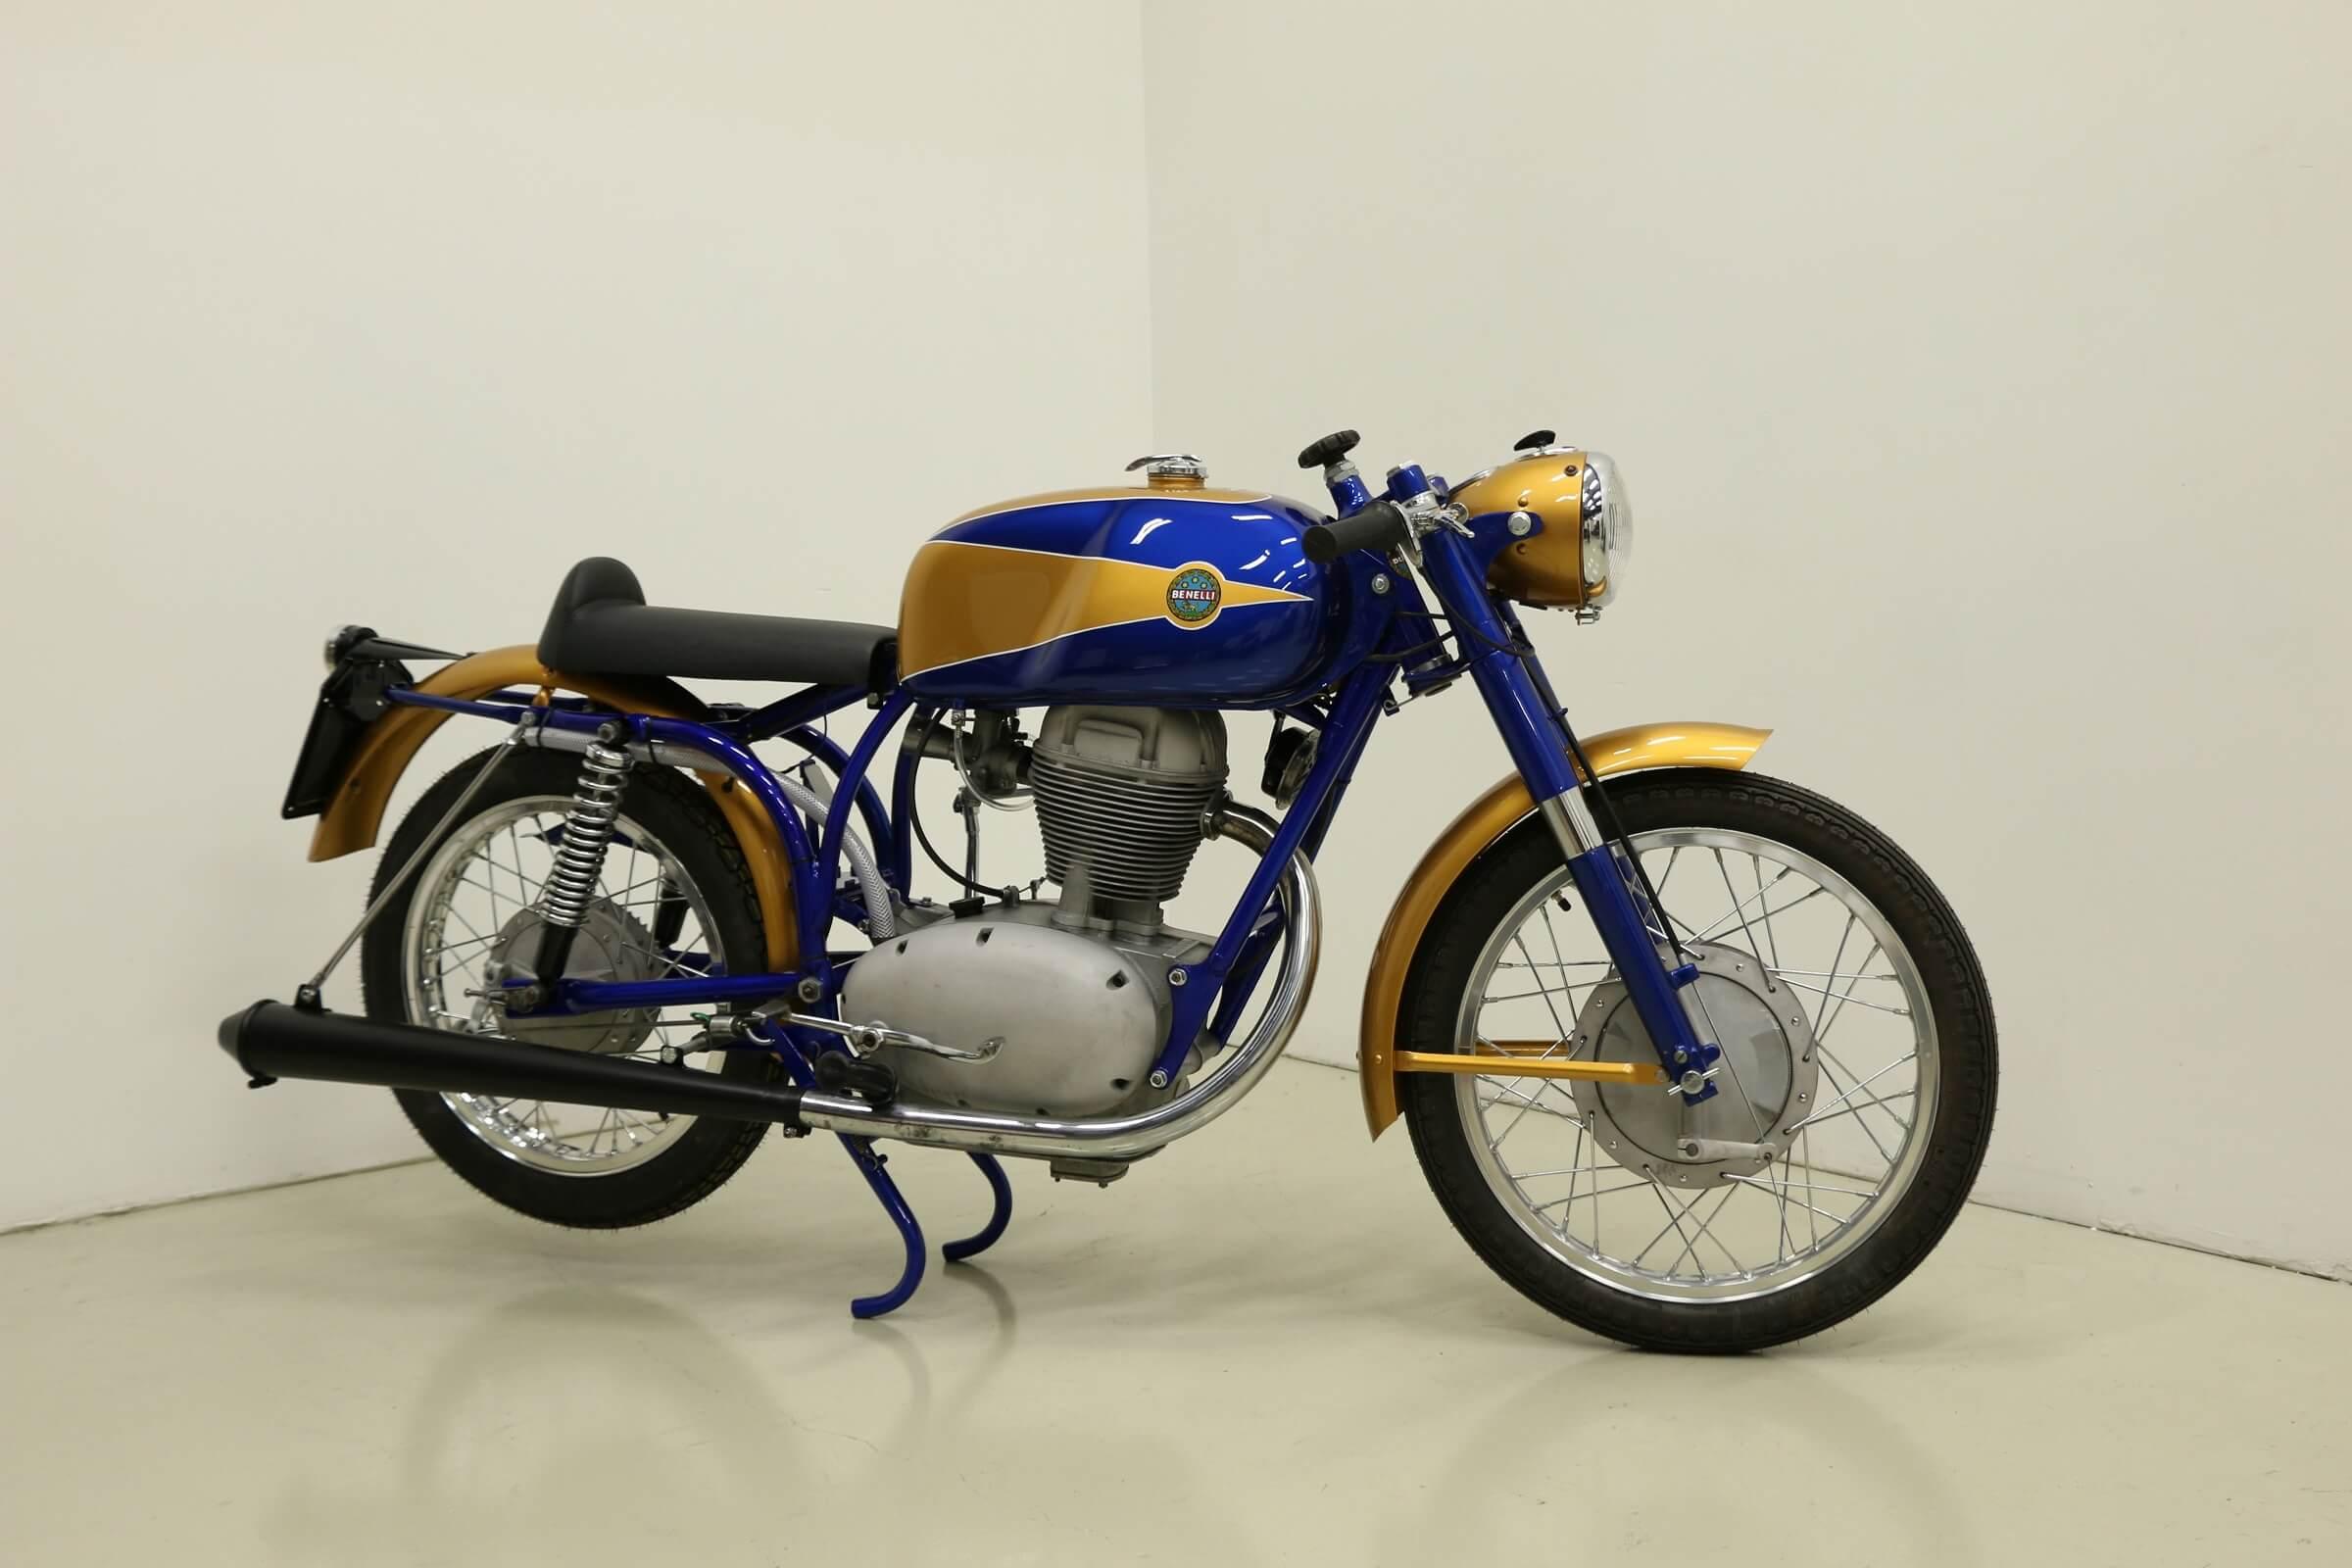 Benelli Vintage Motorcycle Paint Restoration Services Plano Dallas Richardson Allen McKiney Texas